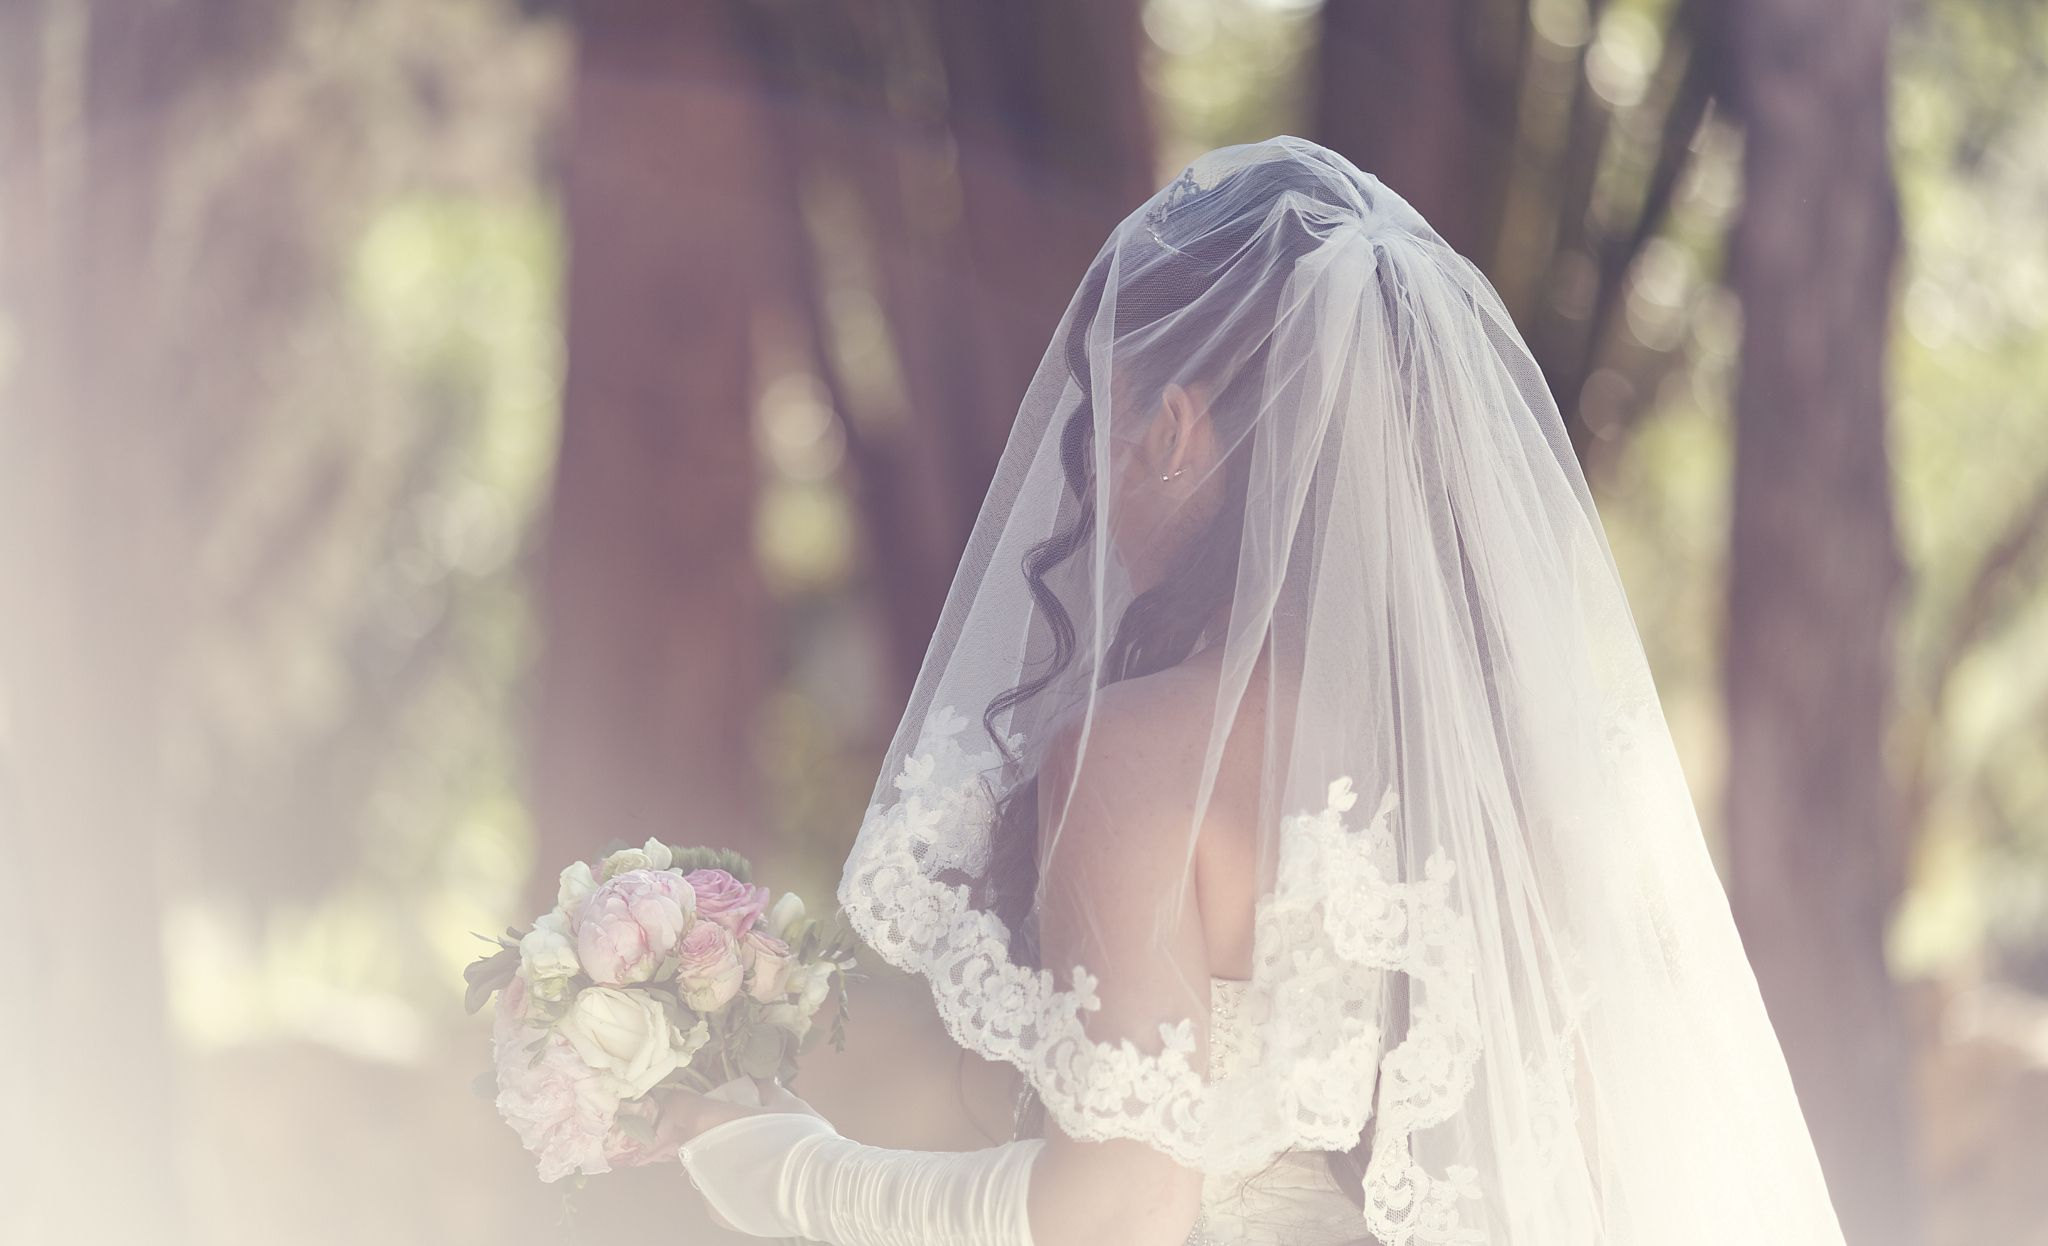 Wedding decorations garden theme december 2018 Elisabeth by Antoine Vandenbrouck on px  Weddings  Pinterest